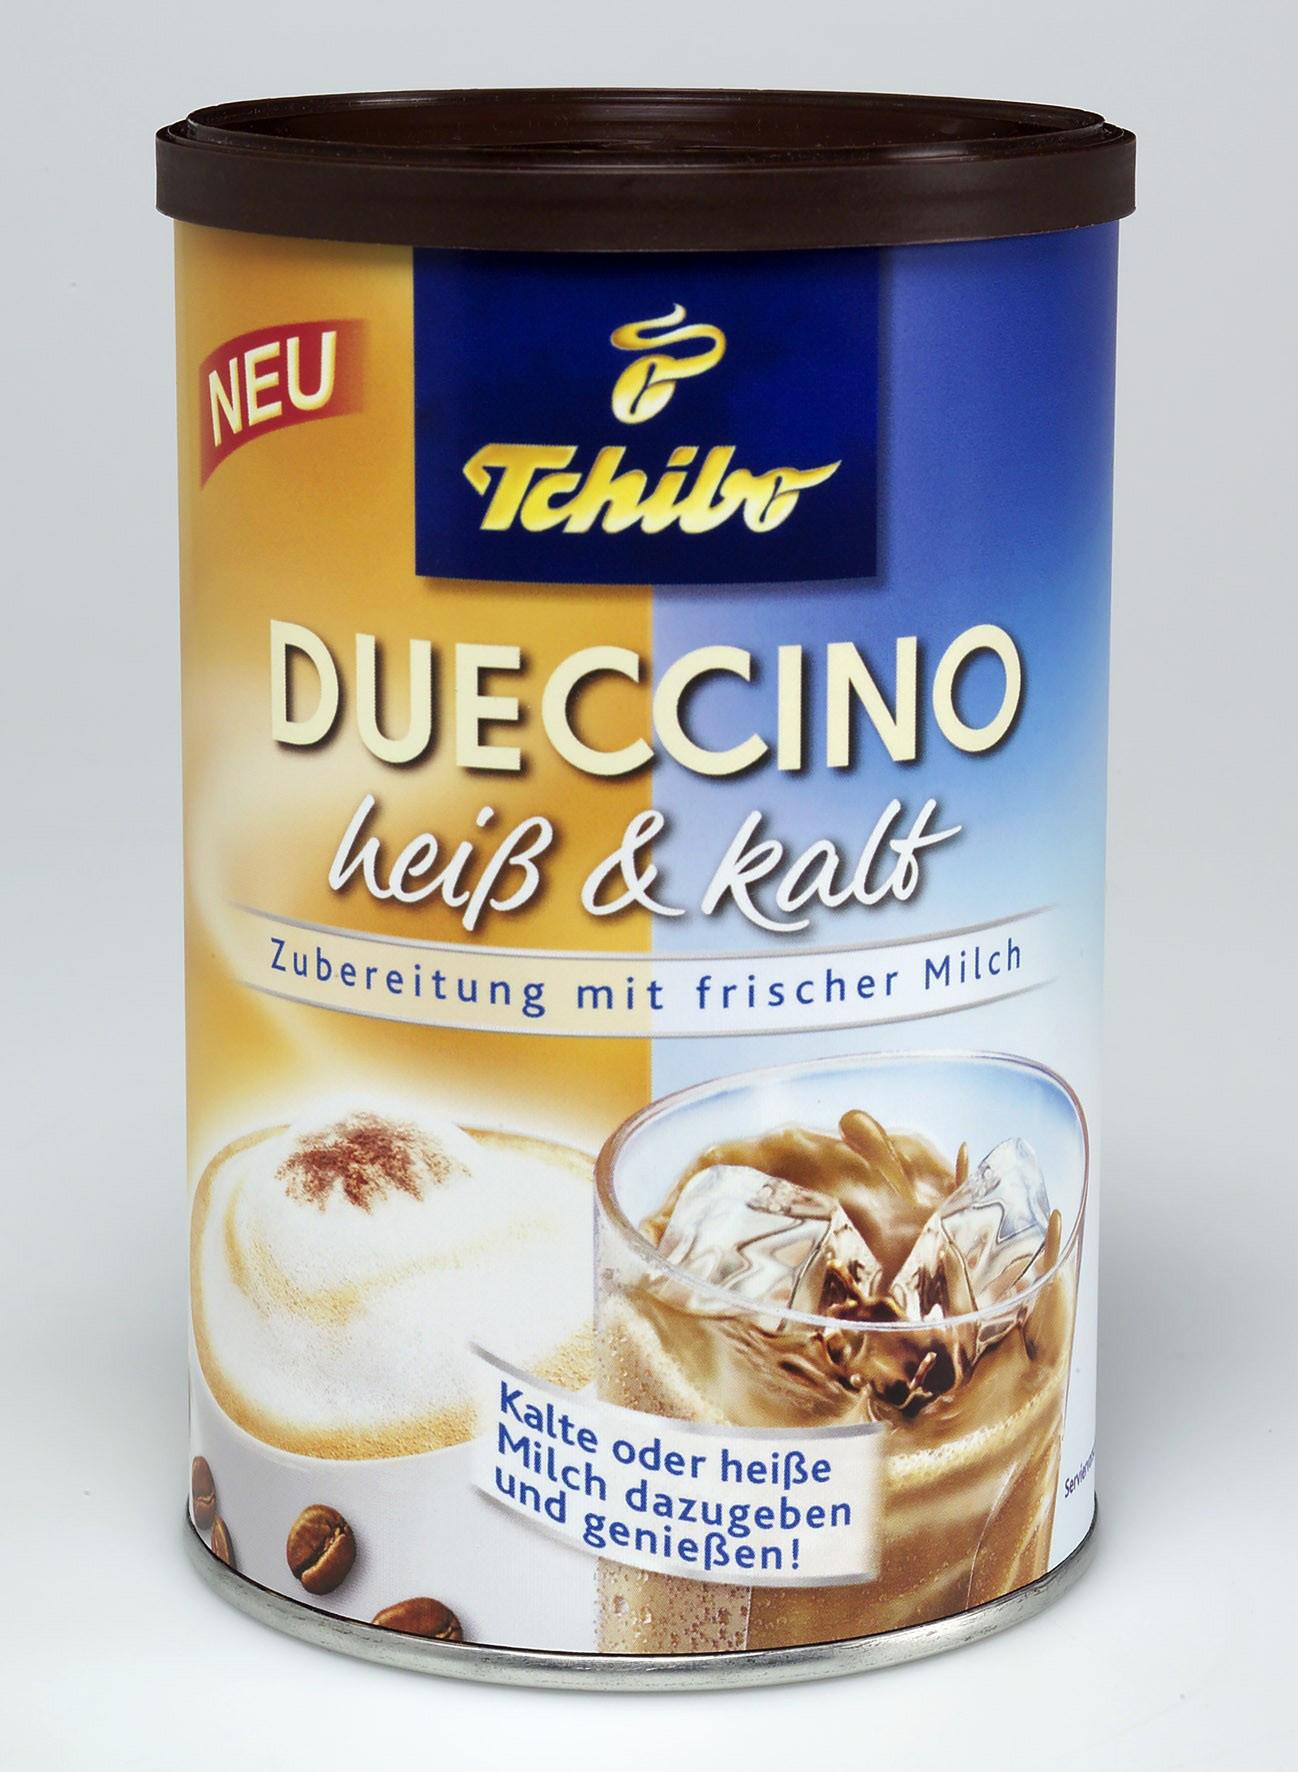 neu tchibo dueccino hei kalt ein doppelter cappuccino genuss presseportal. Black Bedroom Furniture Sets. Home Design Ideas